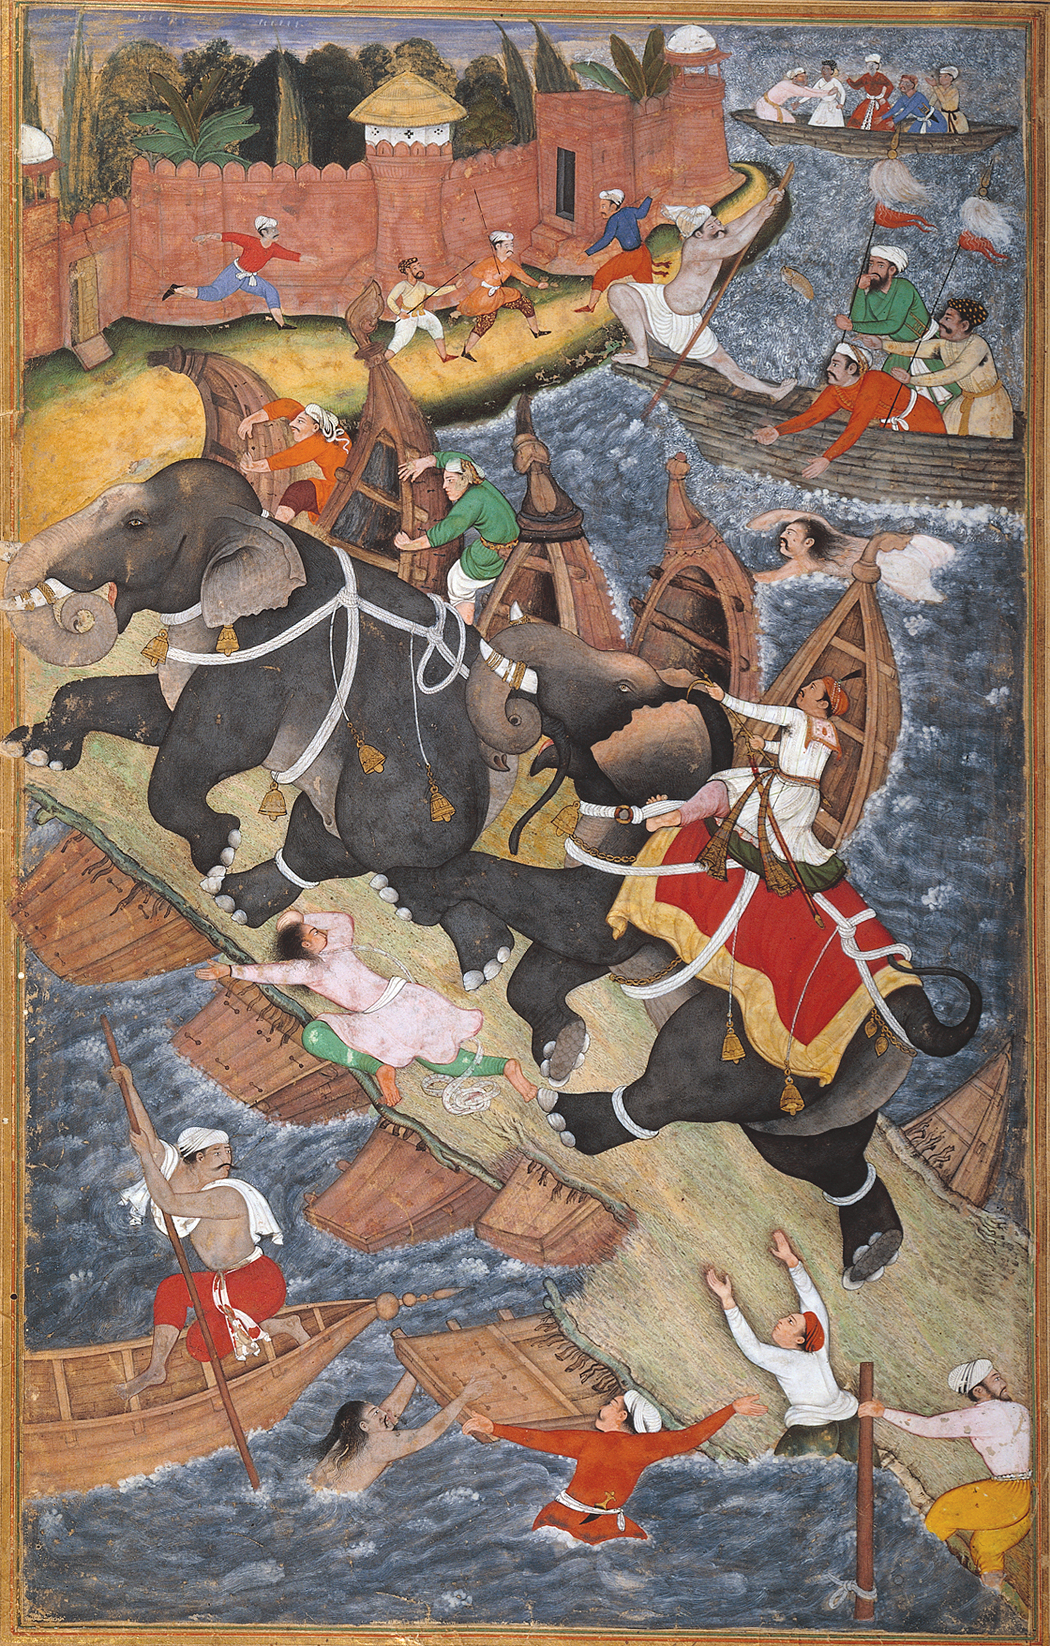 BASAWAN and CHATAR MUNI - Akbar and the Elephant Hawai